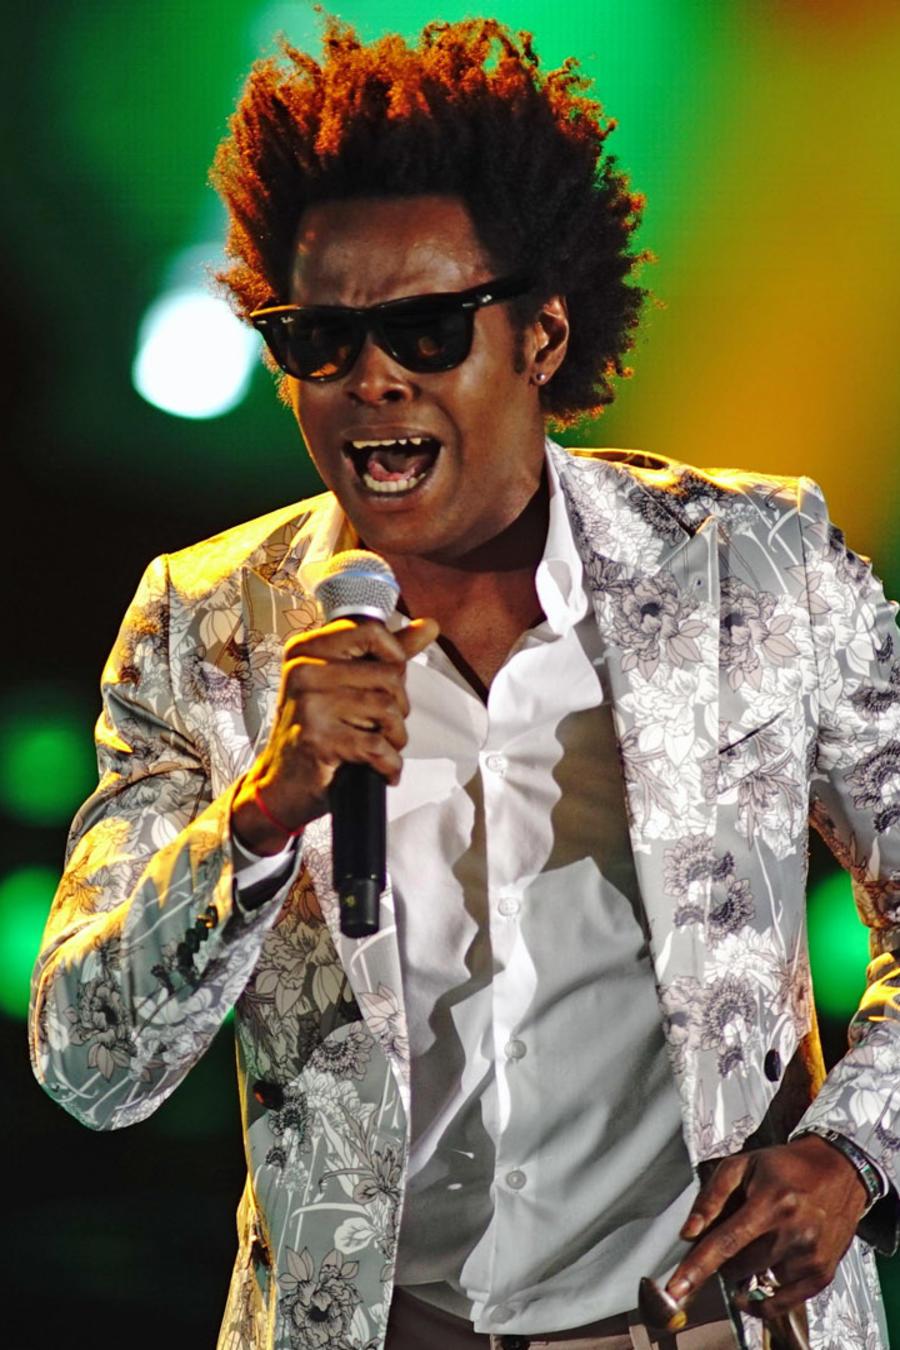 Albin St. Rose en la semifinal de La Voz US 2